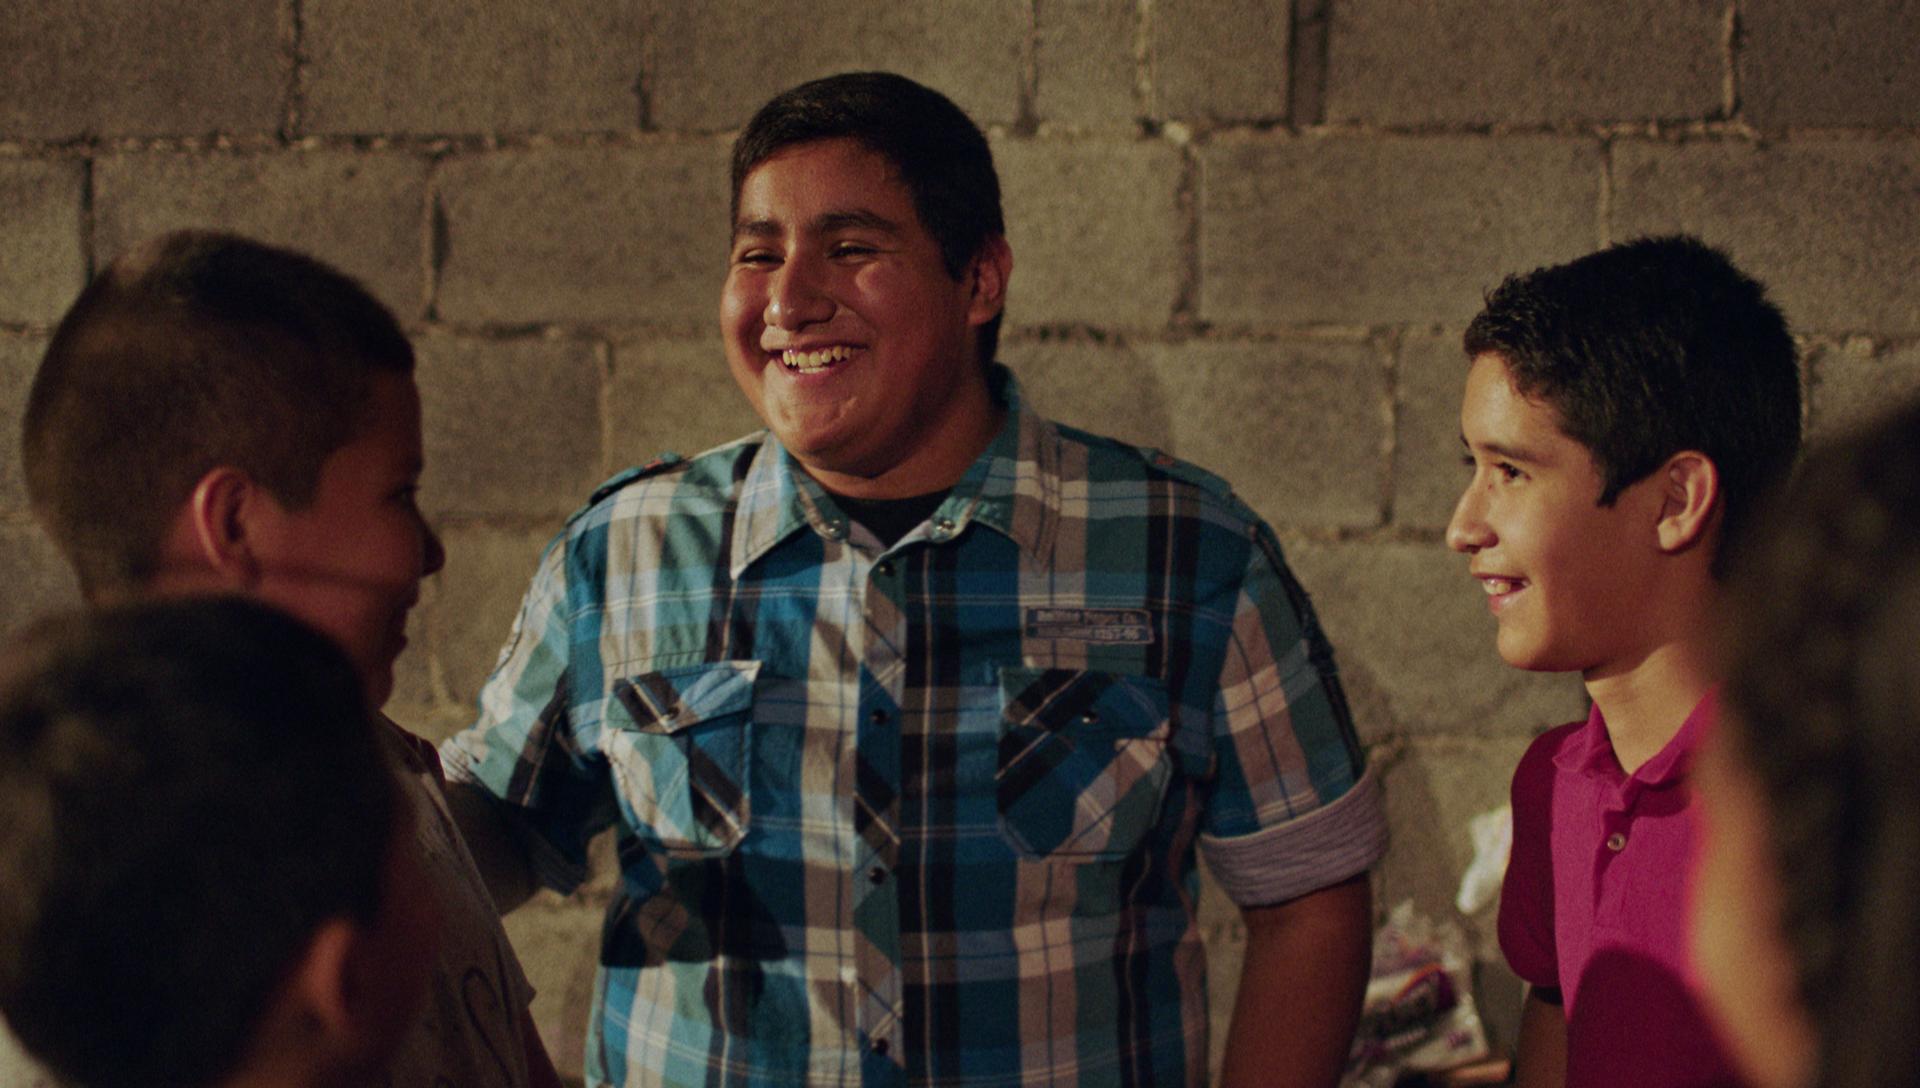 Fernando_with family.jpg